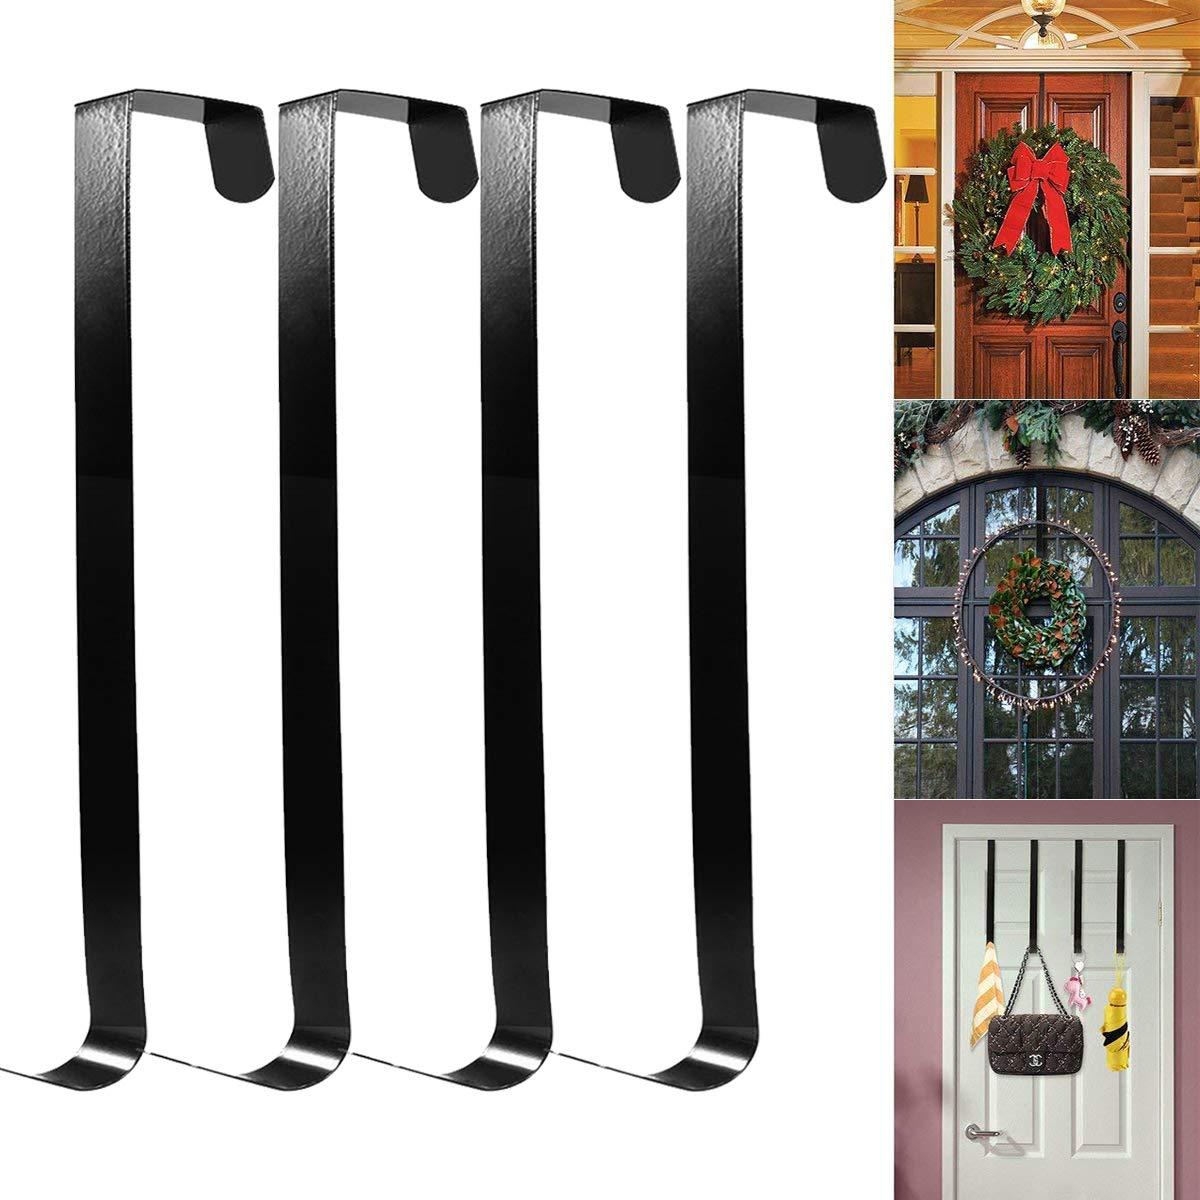 HOMEMAXS Metal Wreath Hanger Over The Door Wreath Holder 4 Packs 13.8inch Larger Wreath Metal Hook for Christmas (Black)